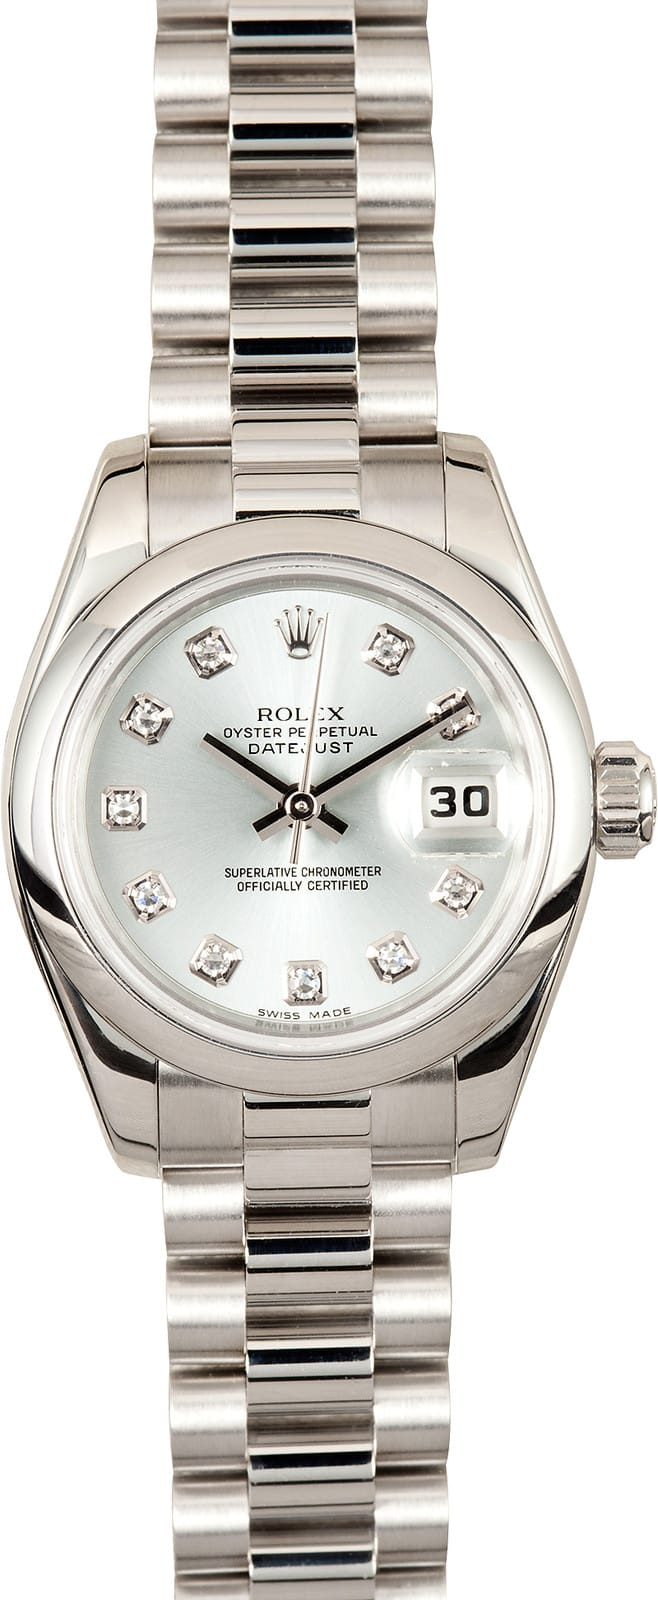 Certified Pre Owned >> Rolex Ladies Presidential 179166 Platinum Glacier Blue at ...